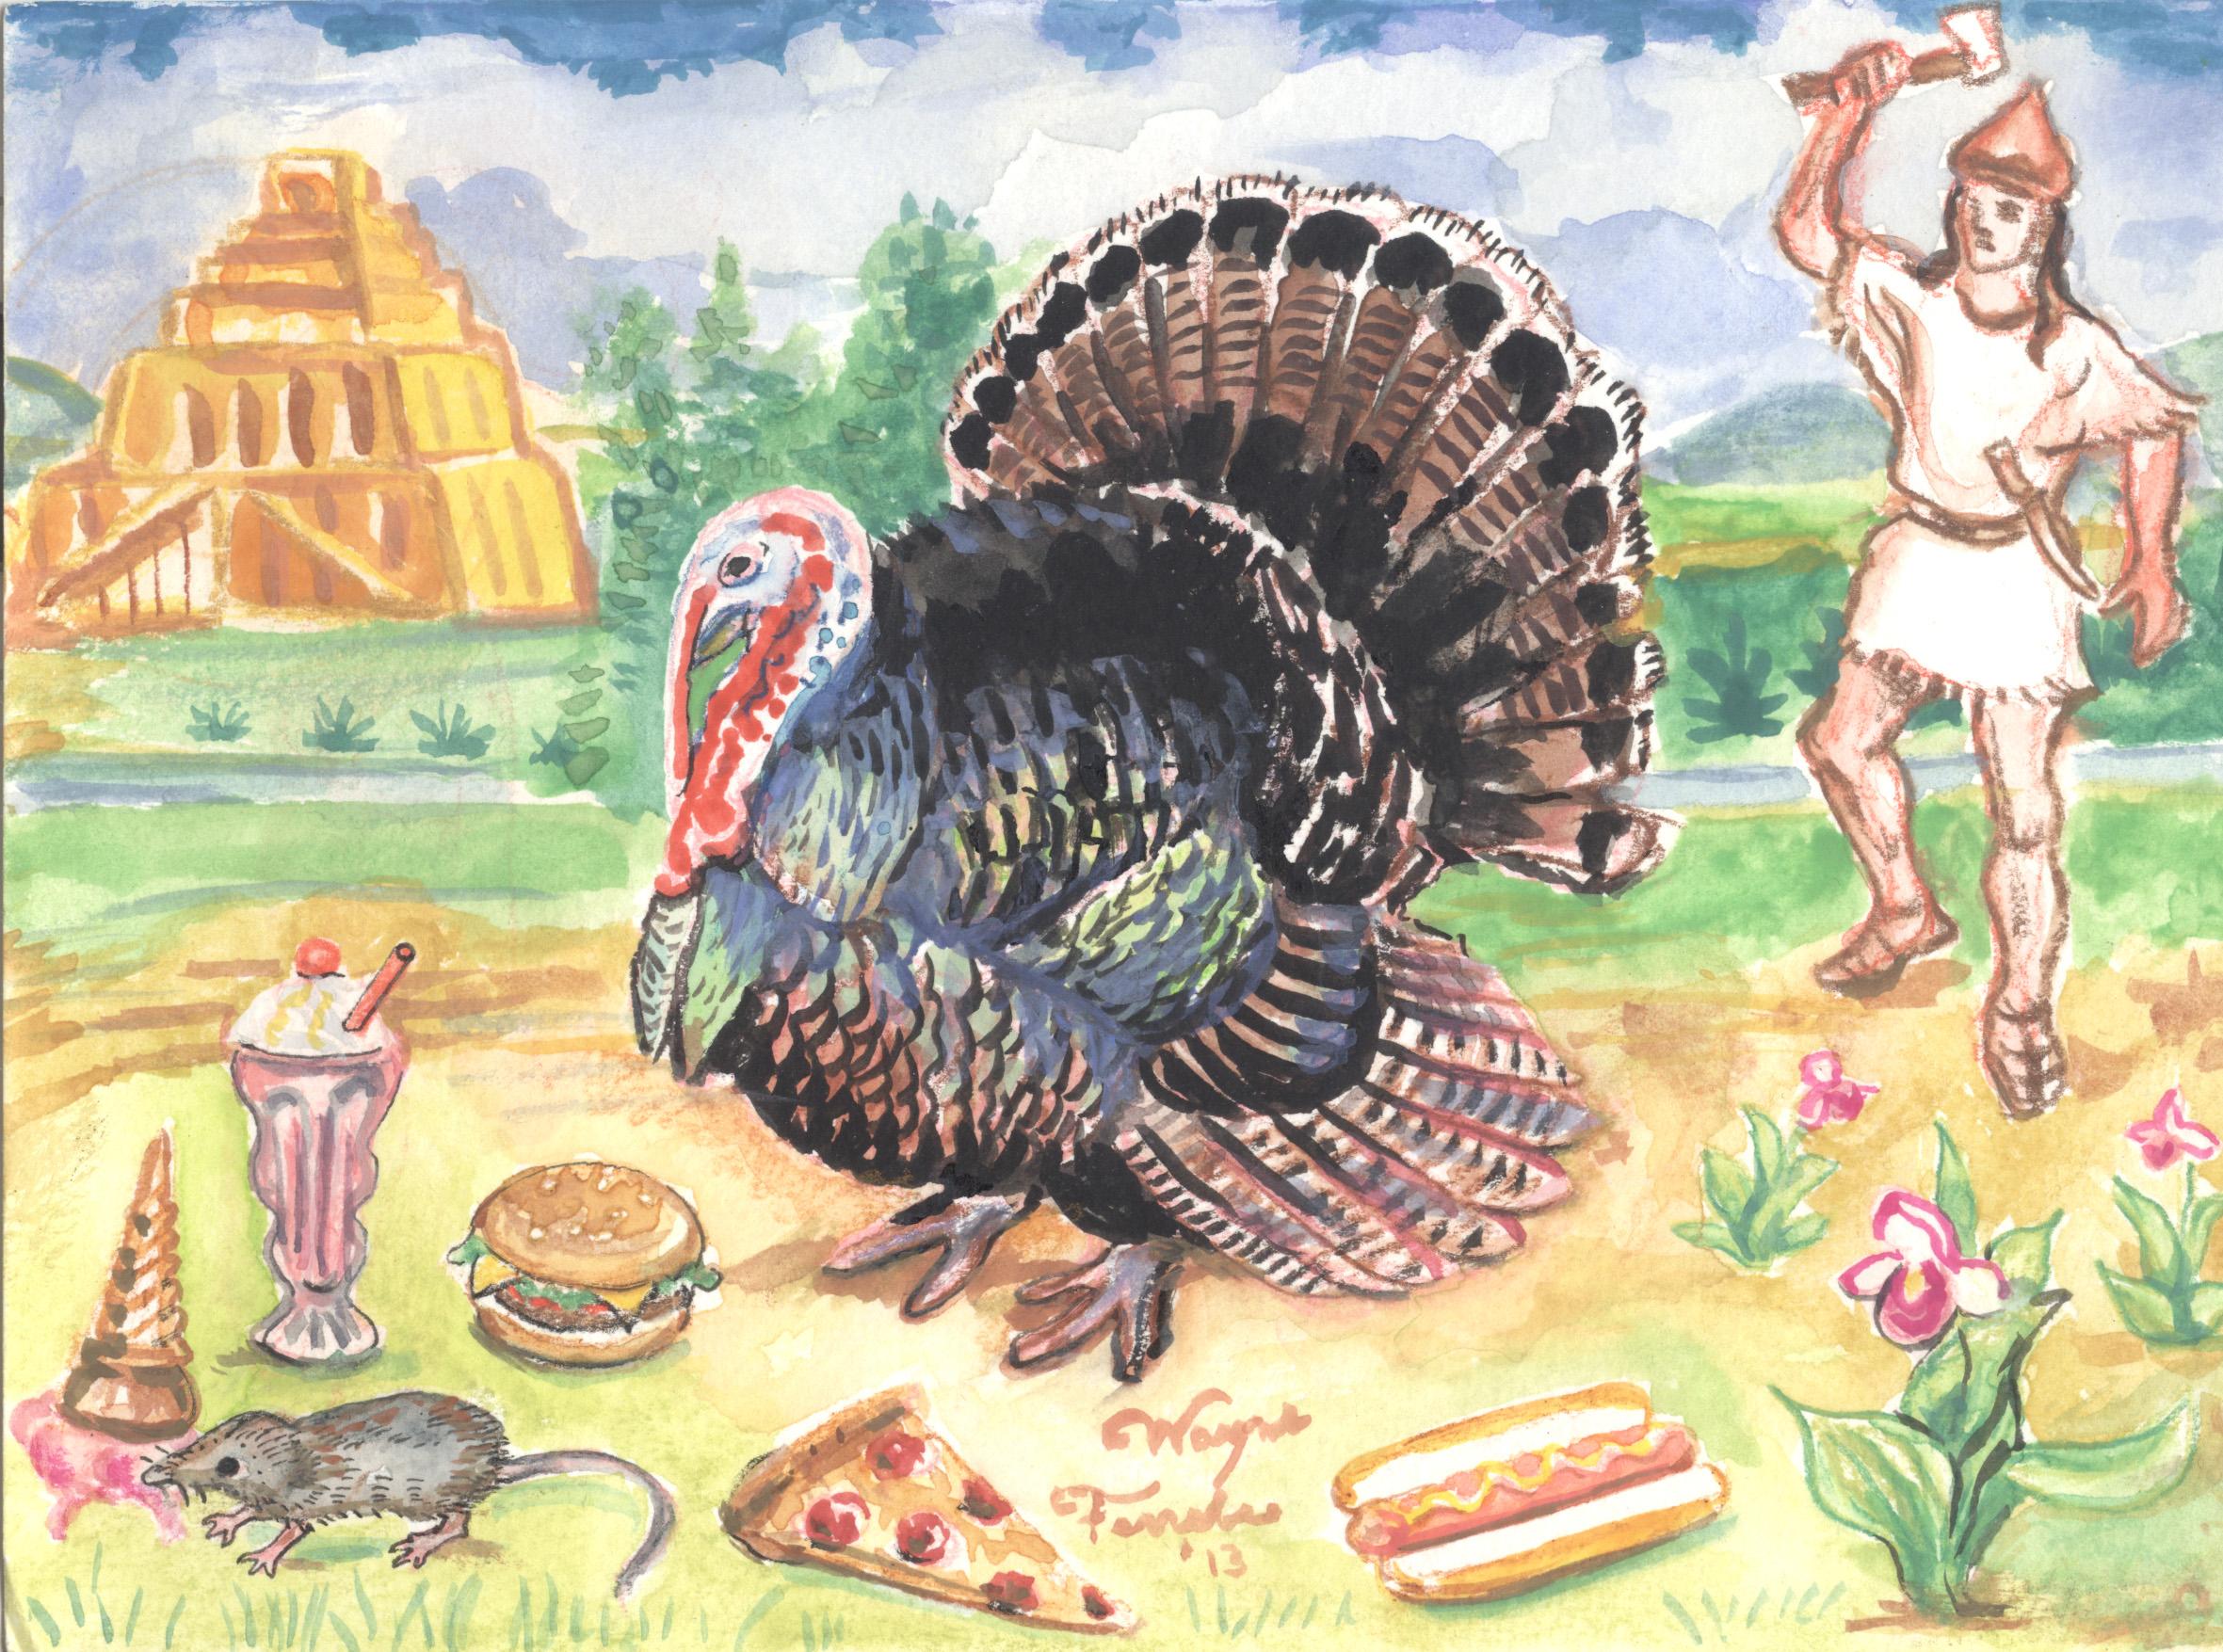 Turkey with Fast Food (Wayne Ferrebee, 2013, watercolor on paper)